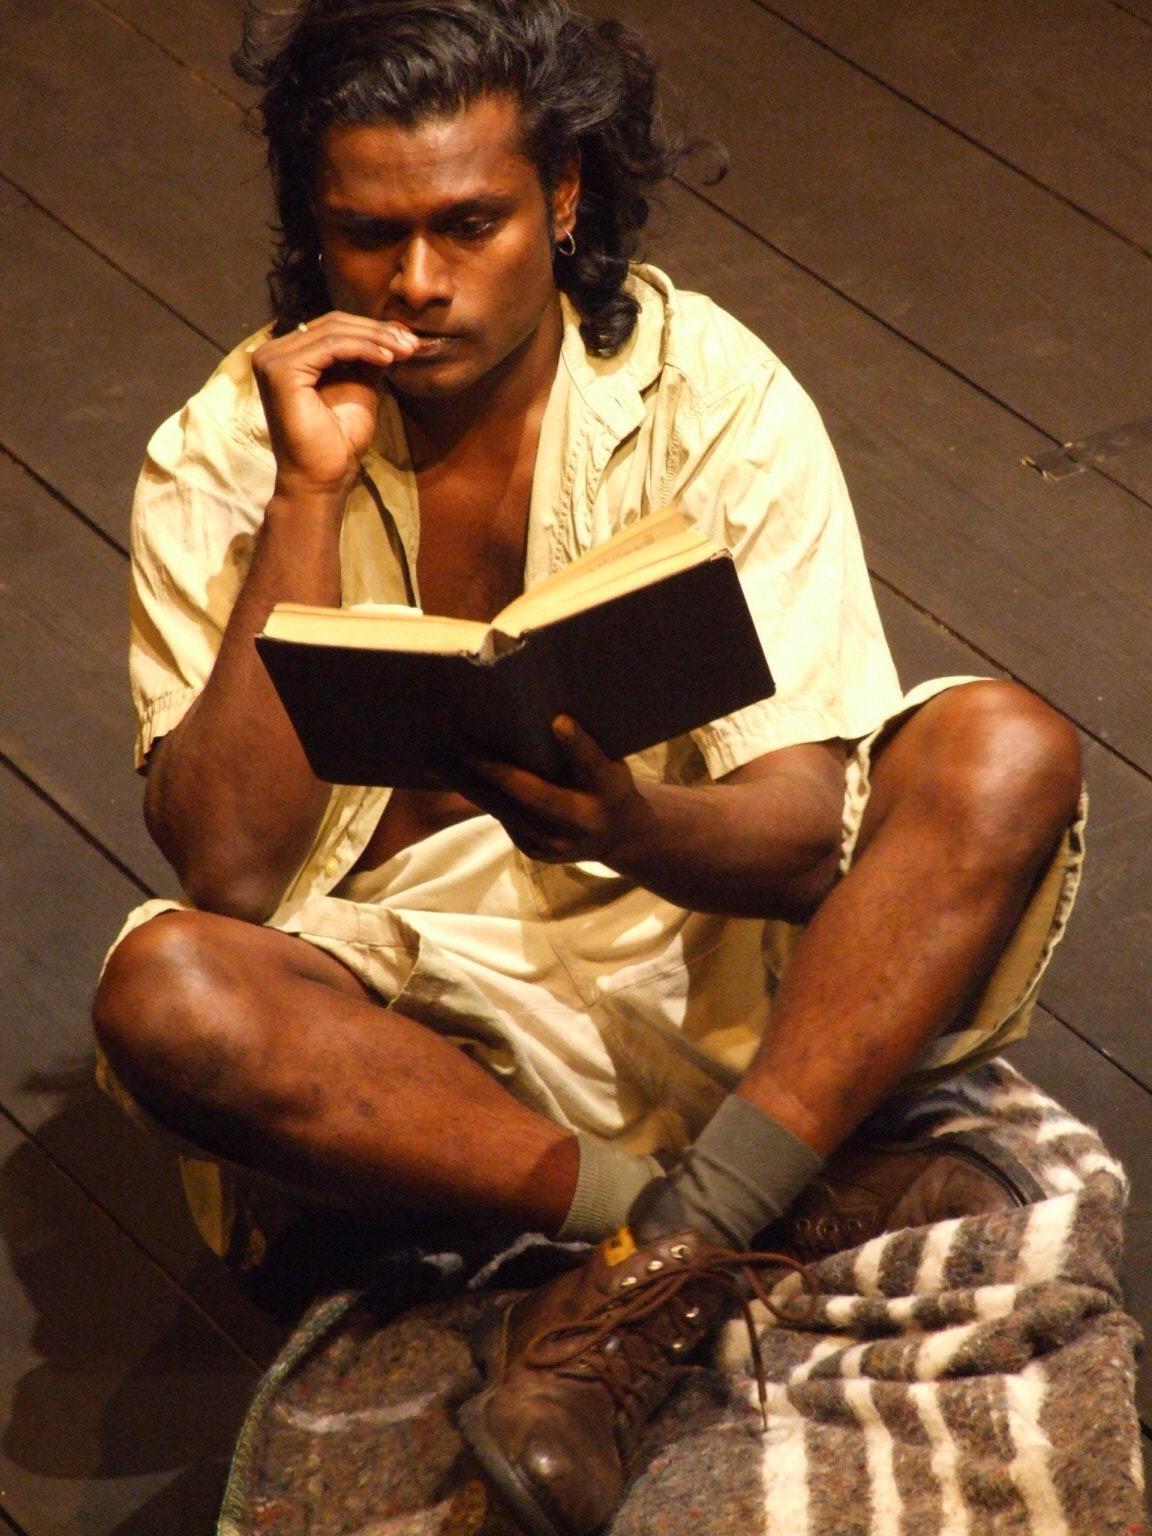 Hamlet sits cross-legged, reading a book.